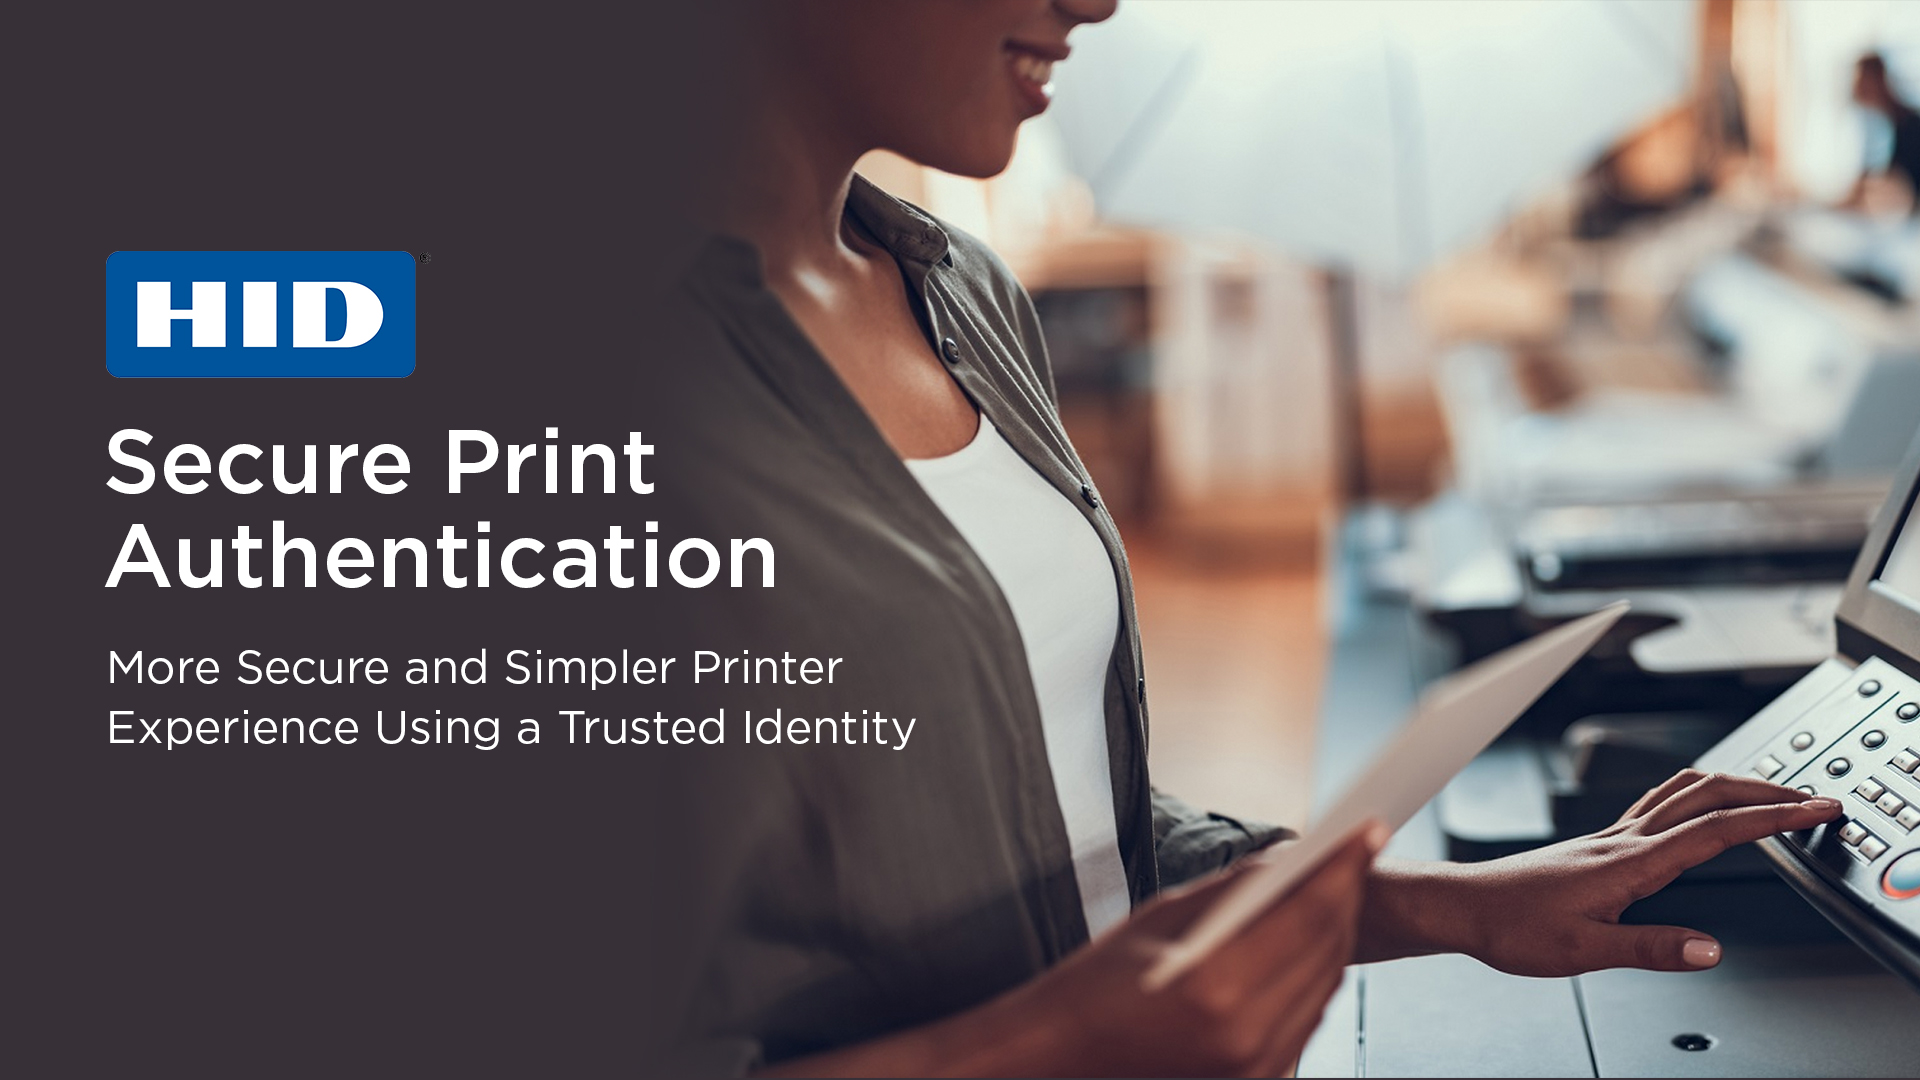 HID Secure Print Authentication